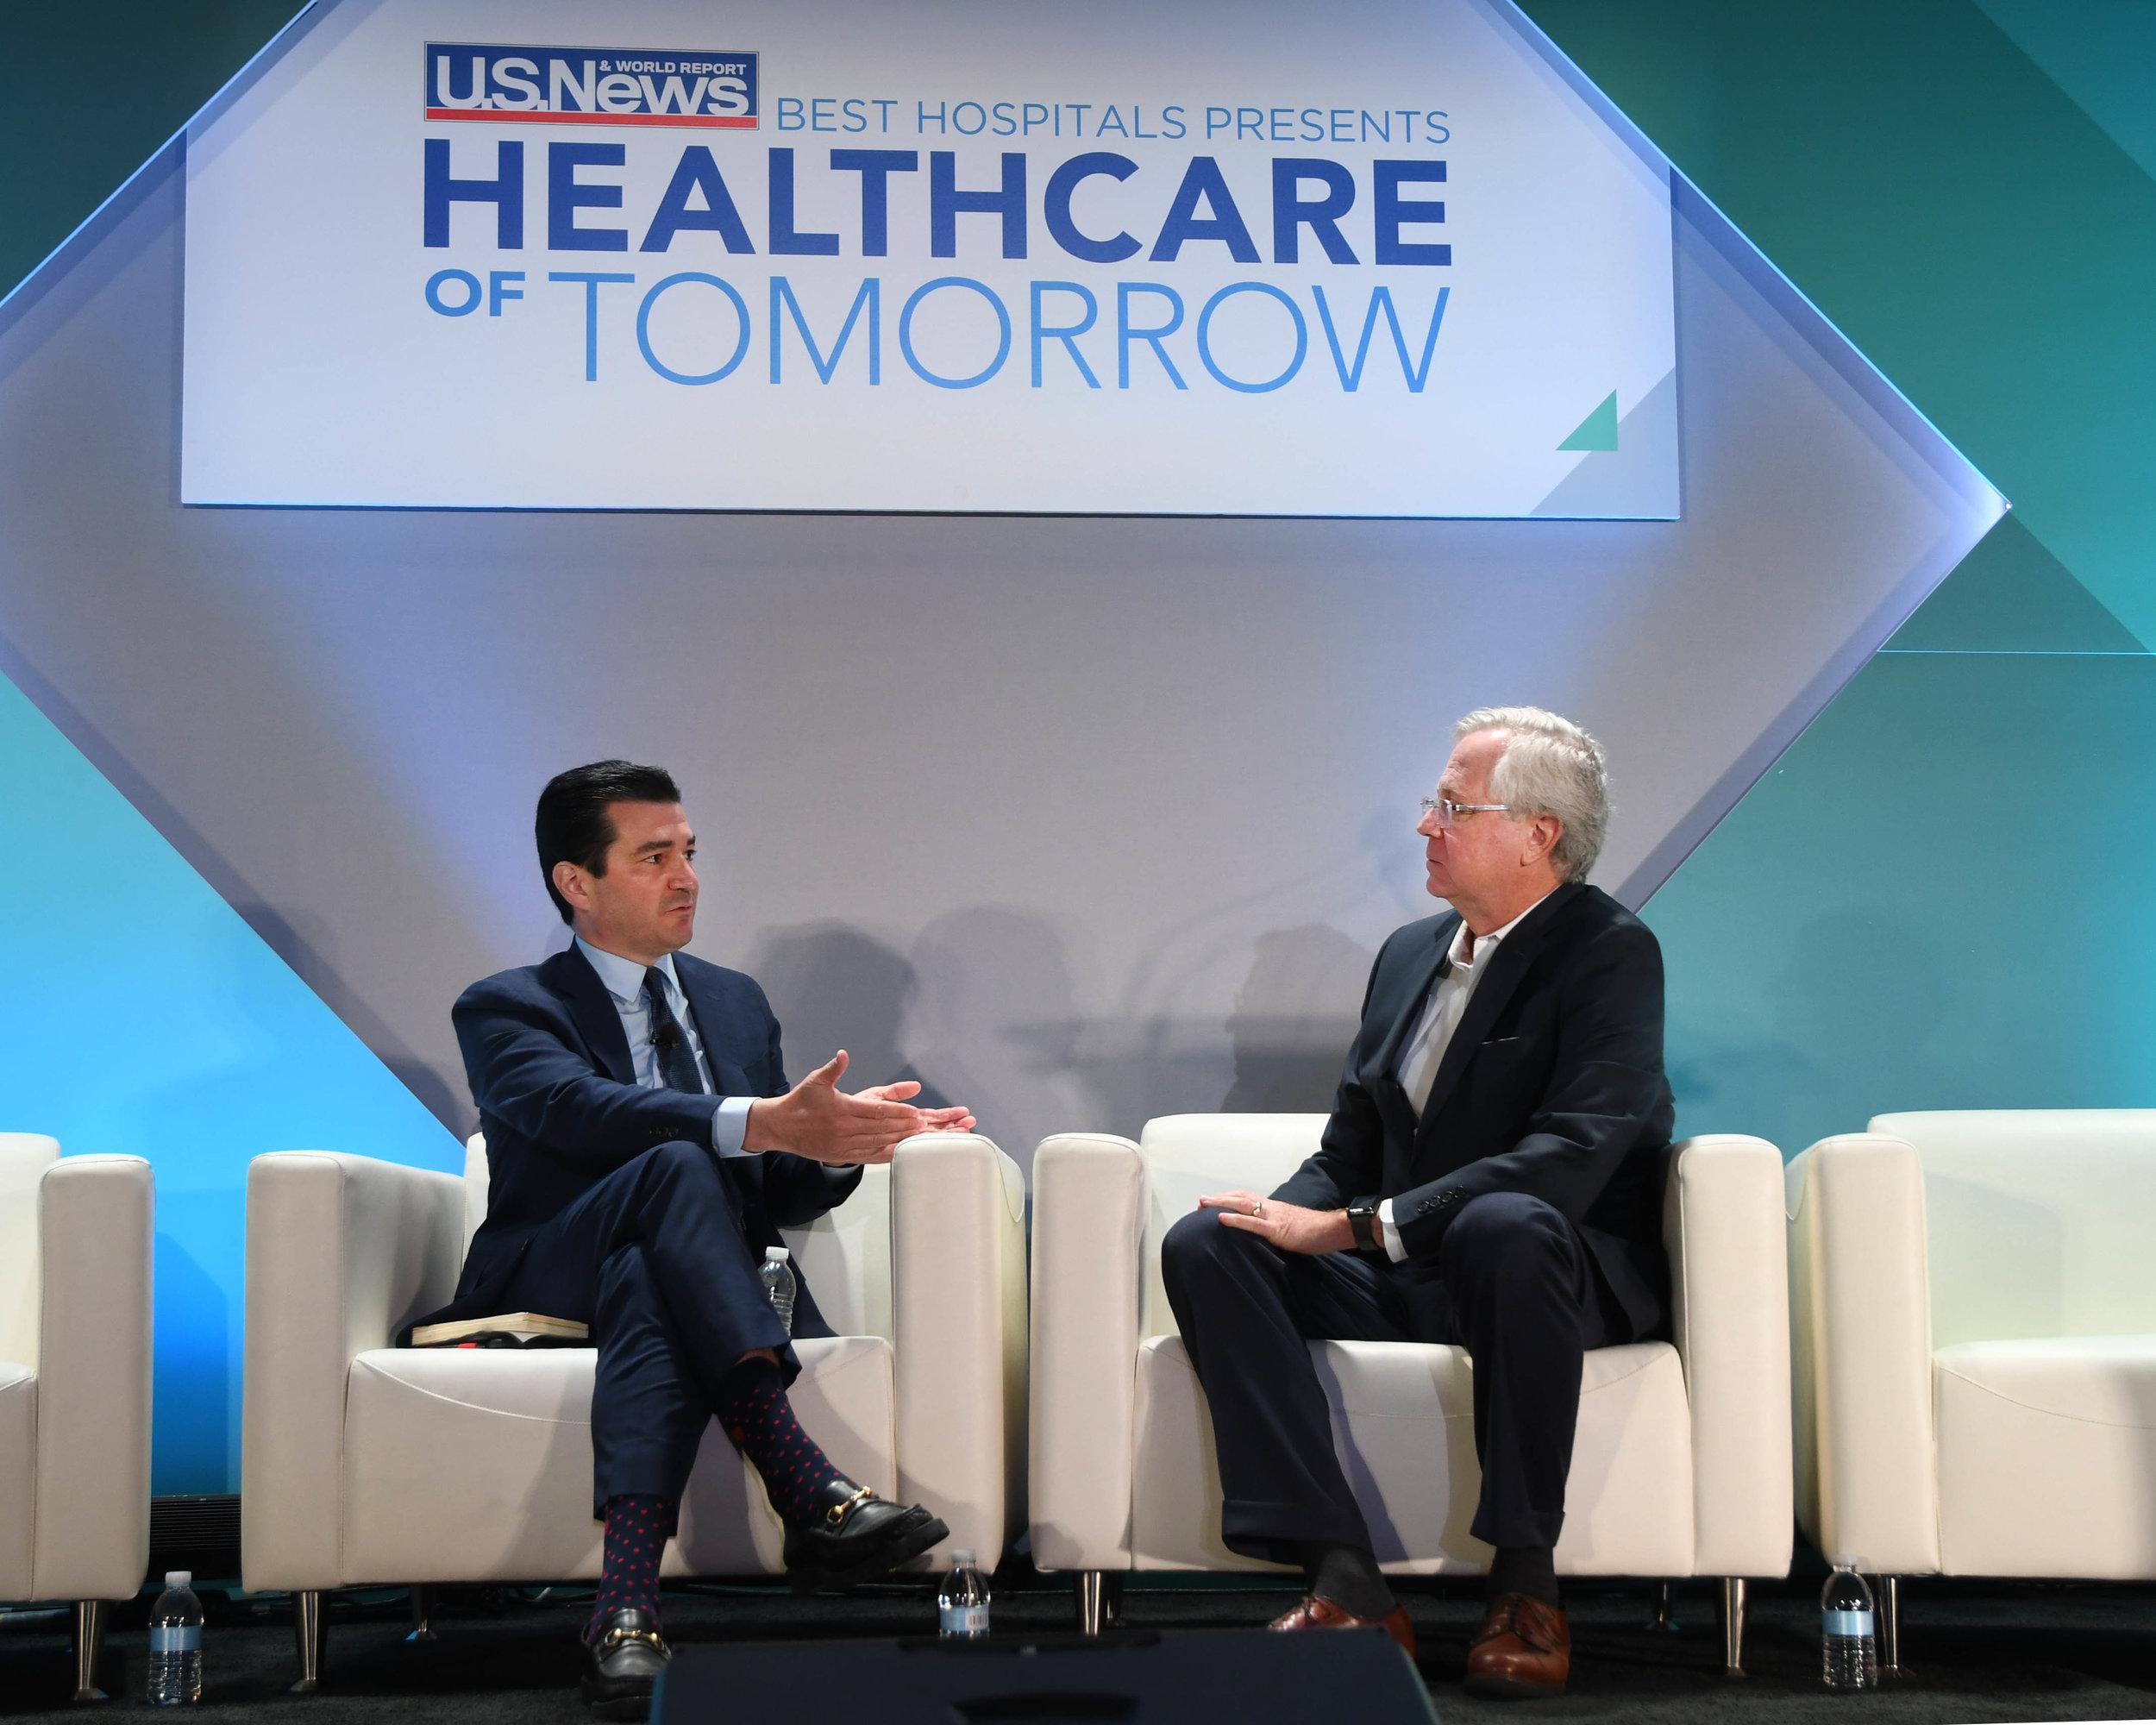 2018 11.16.18 U.S News Best HospitalsPresents Healthcare of Tomorrow20181116_0009.jpg